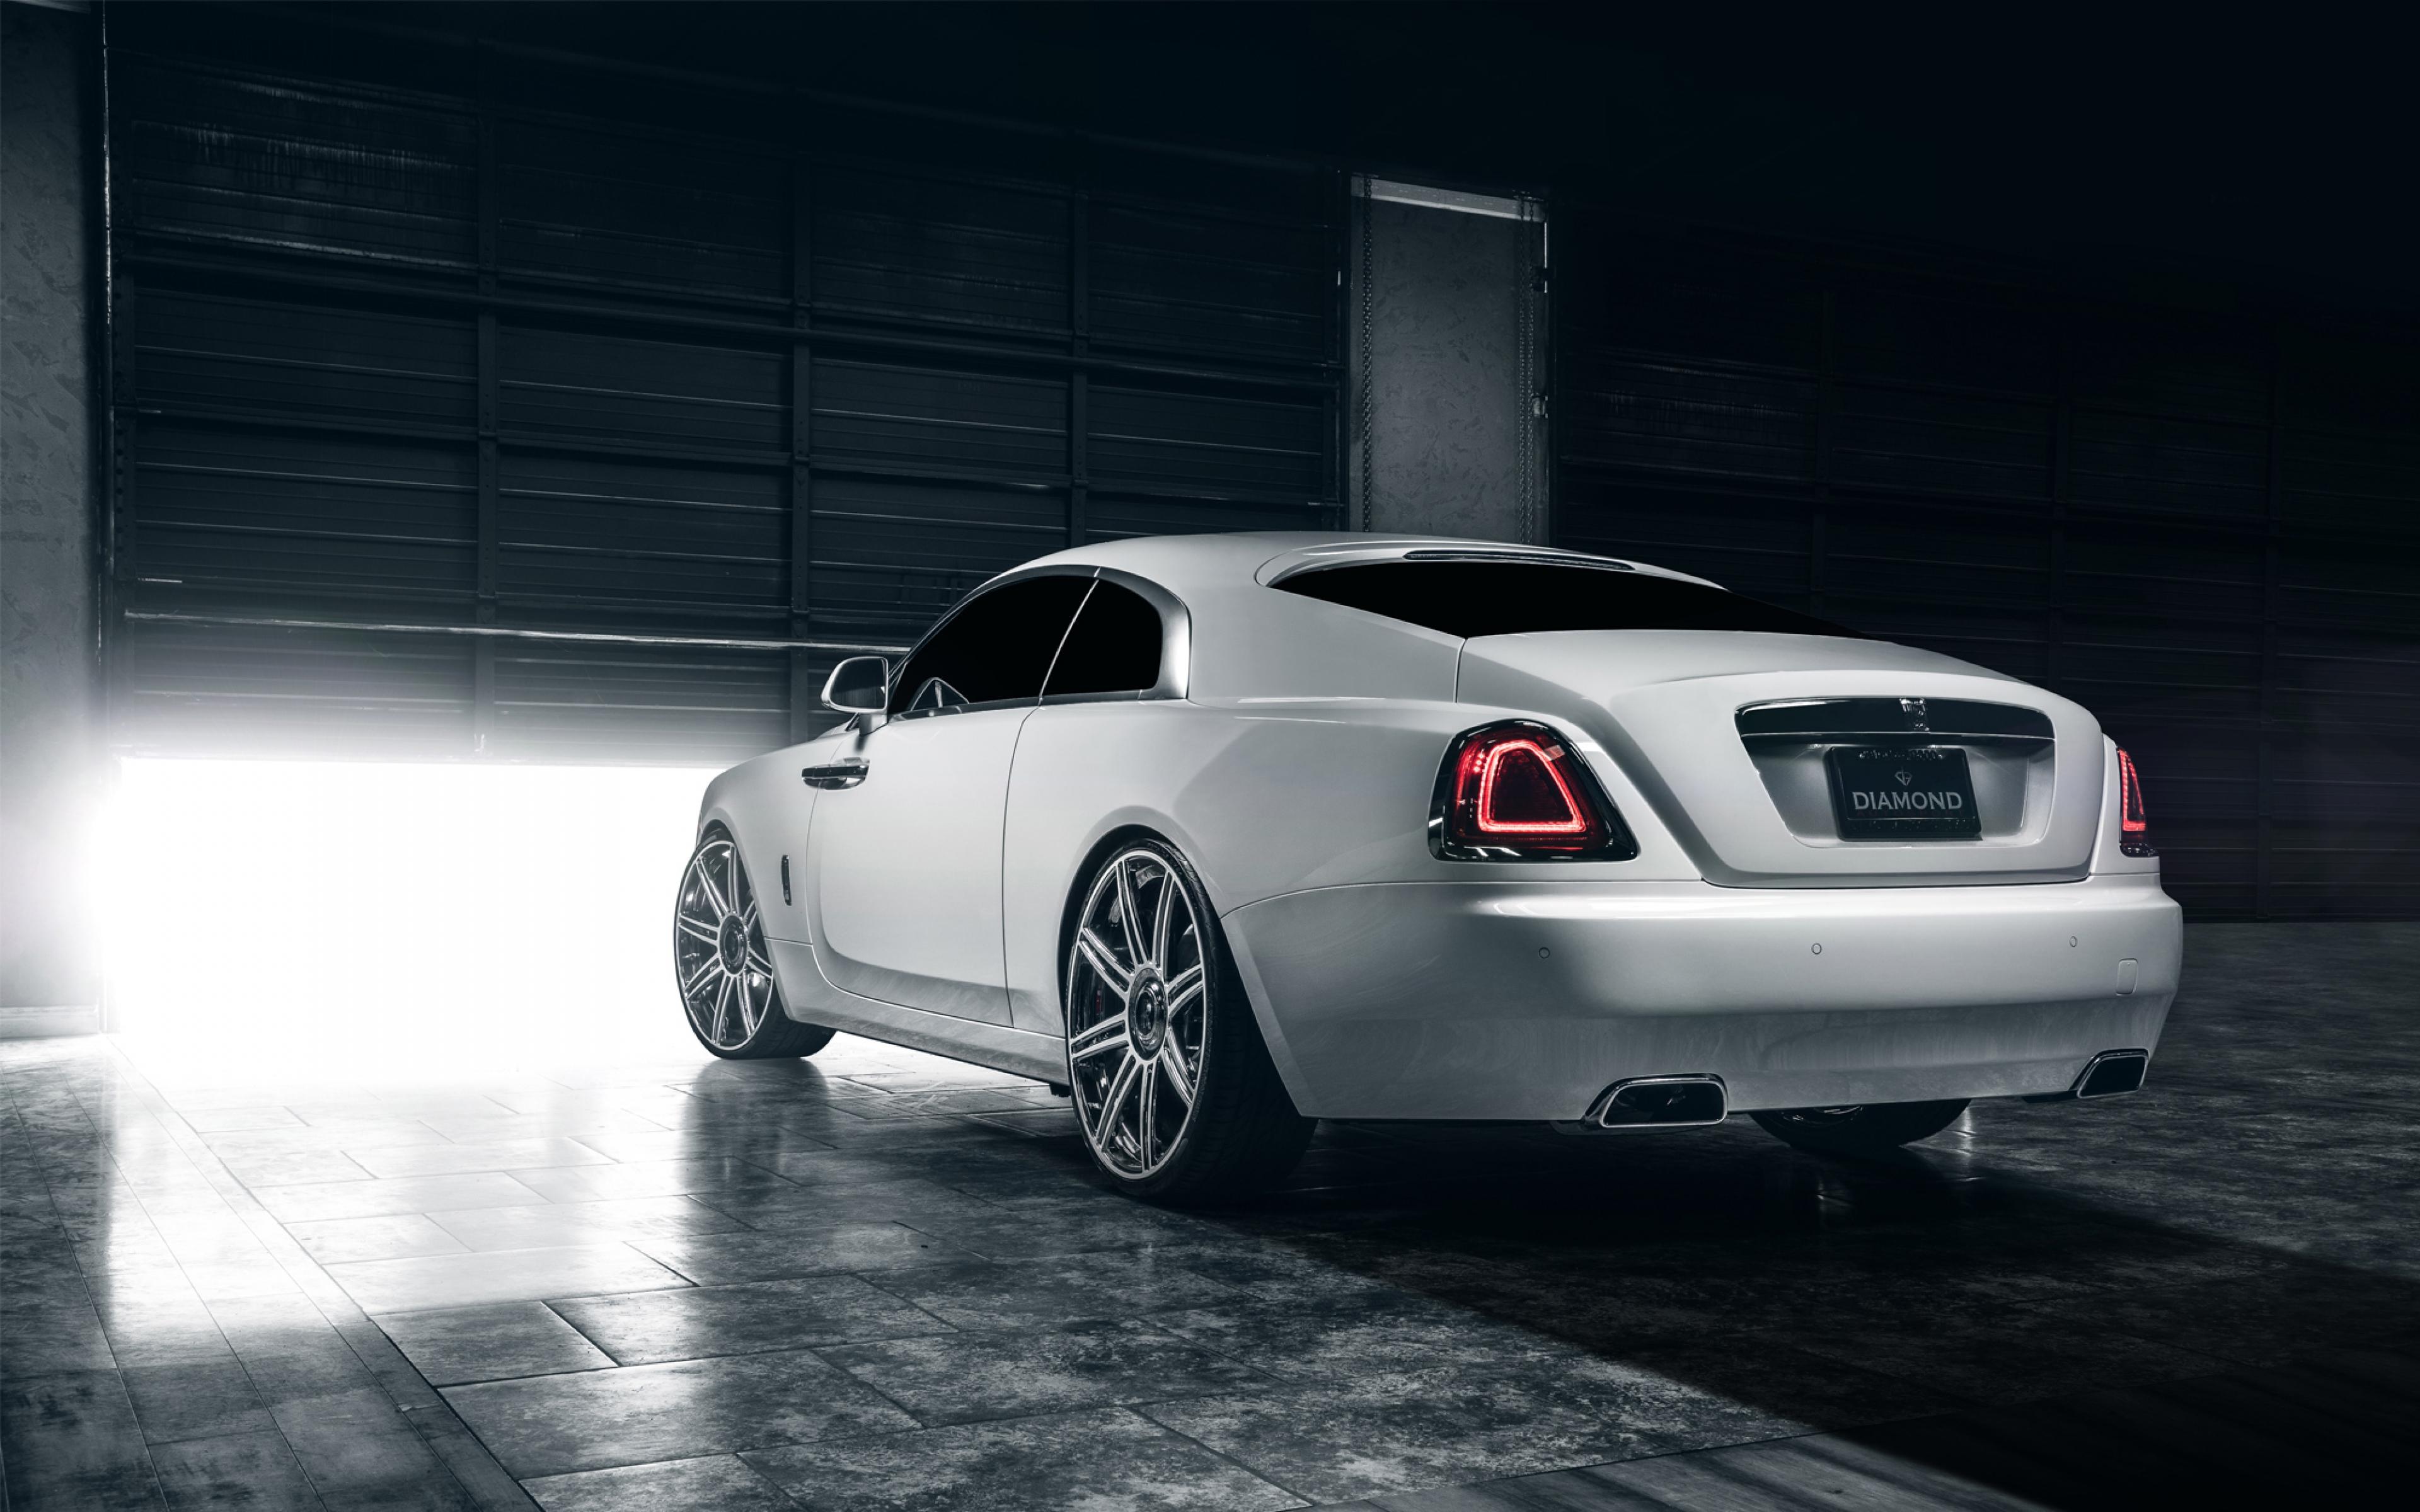 26 stunning hd luxury wallpapers - Rolls royce wallpaper download ...